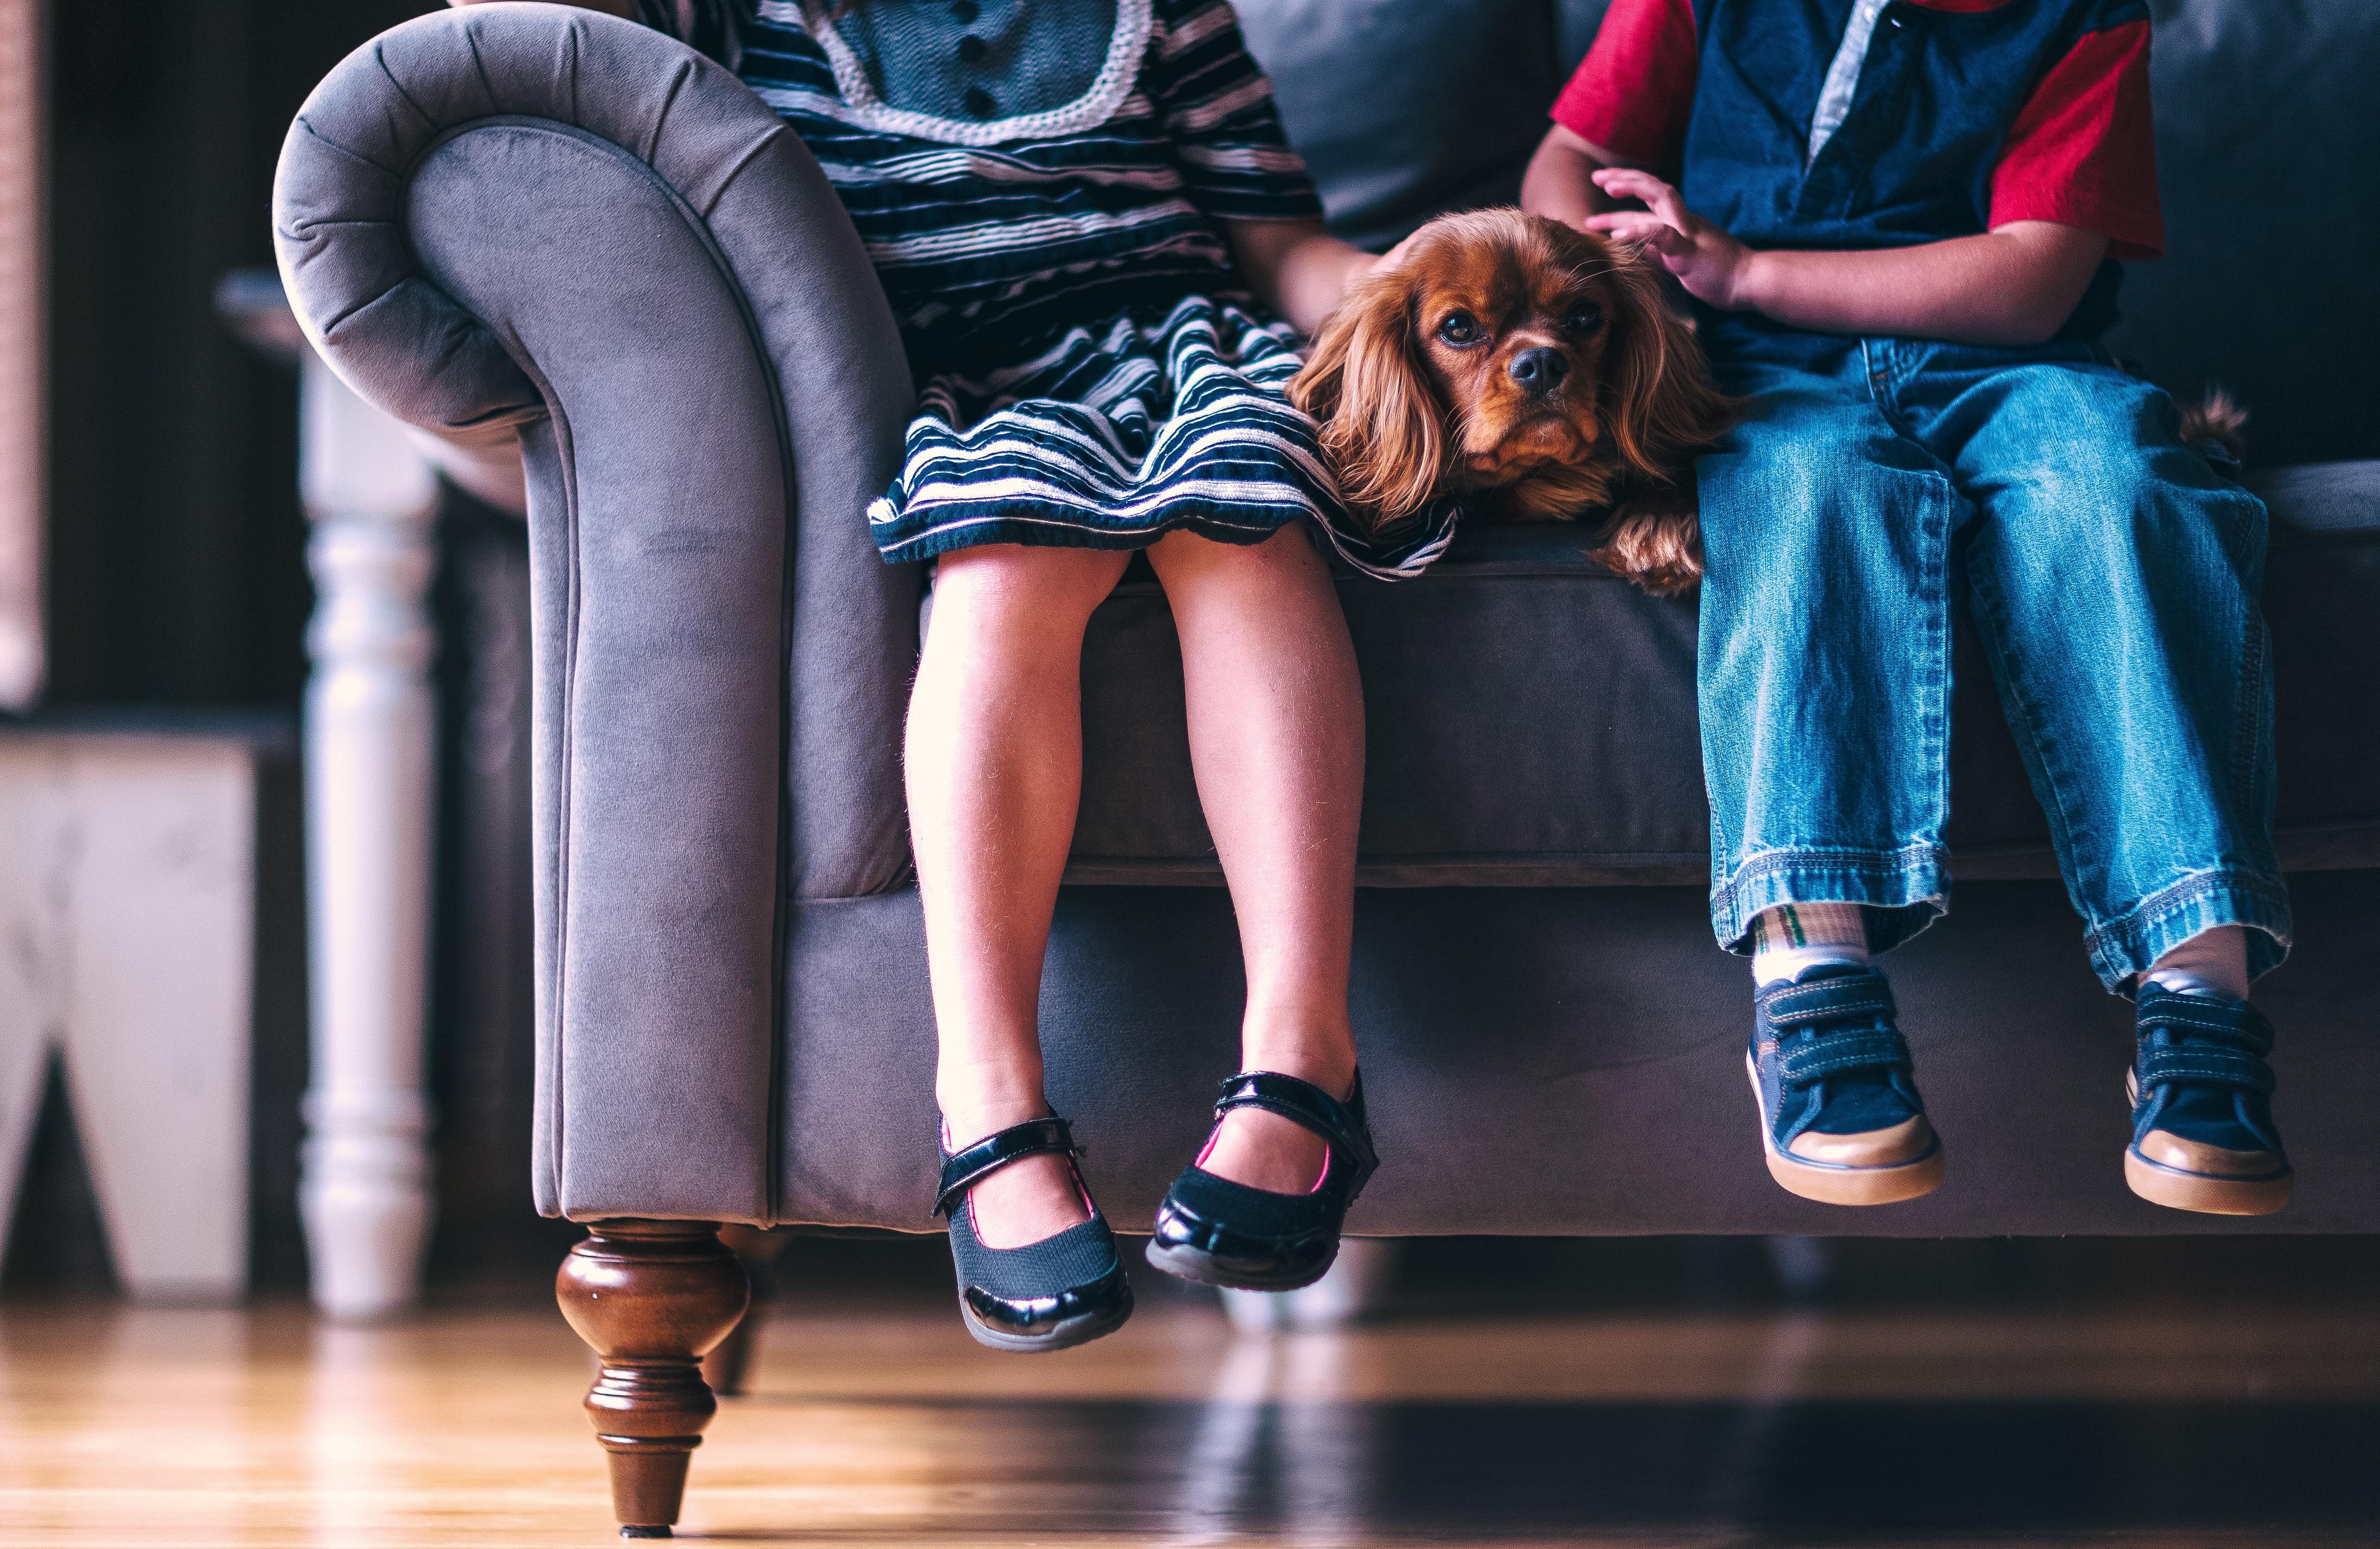 unsplash sofa image The Lounge CO